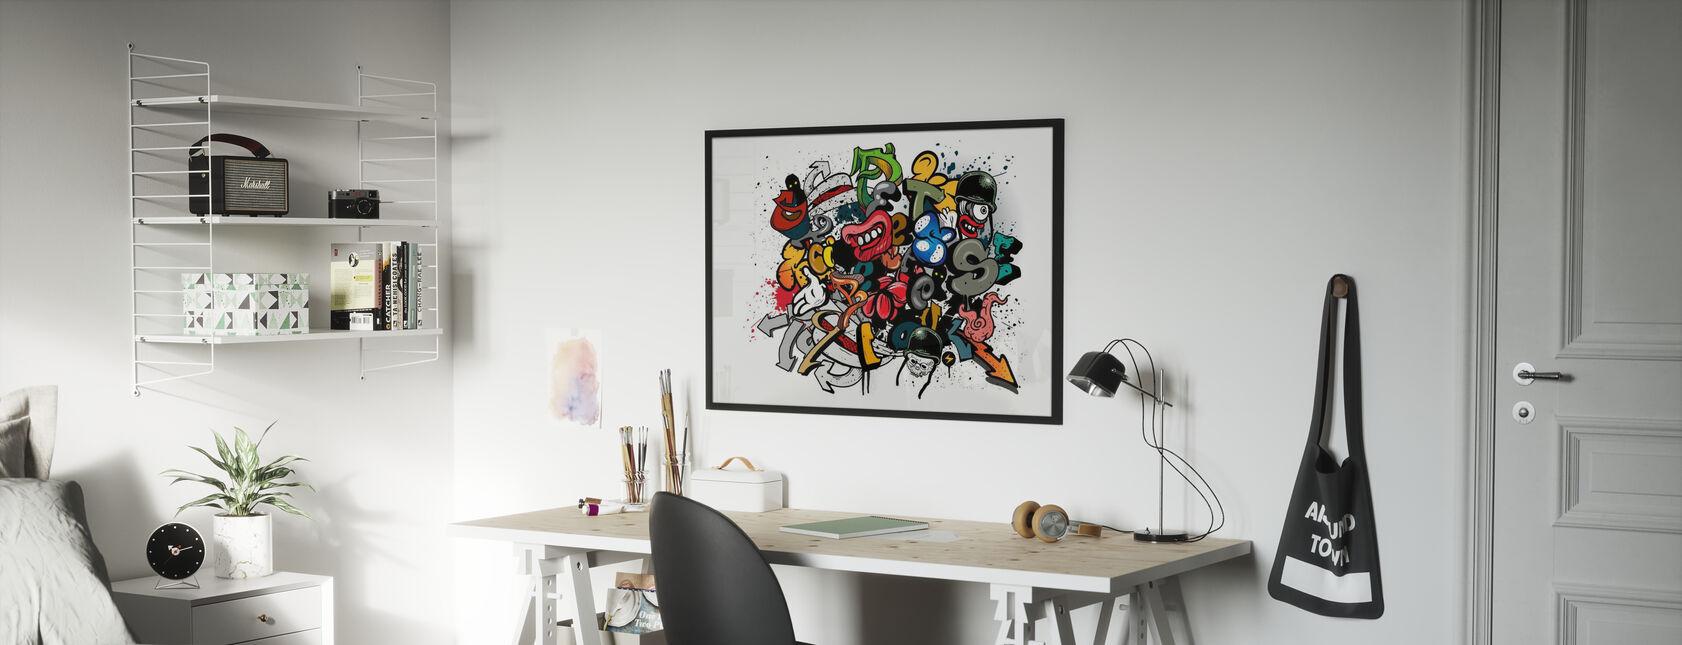 Graffiti-elementer - Innrammet bilde - Barnerom